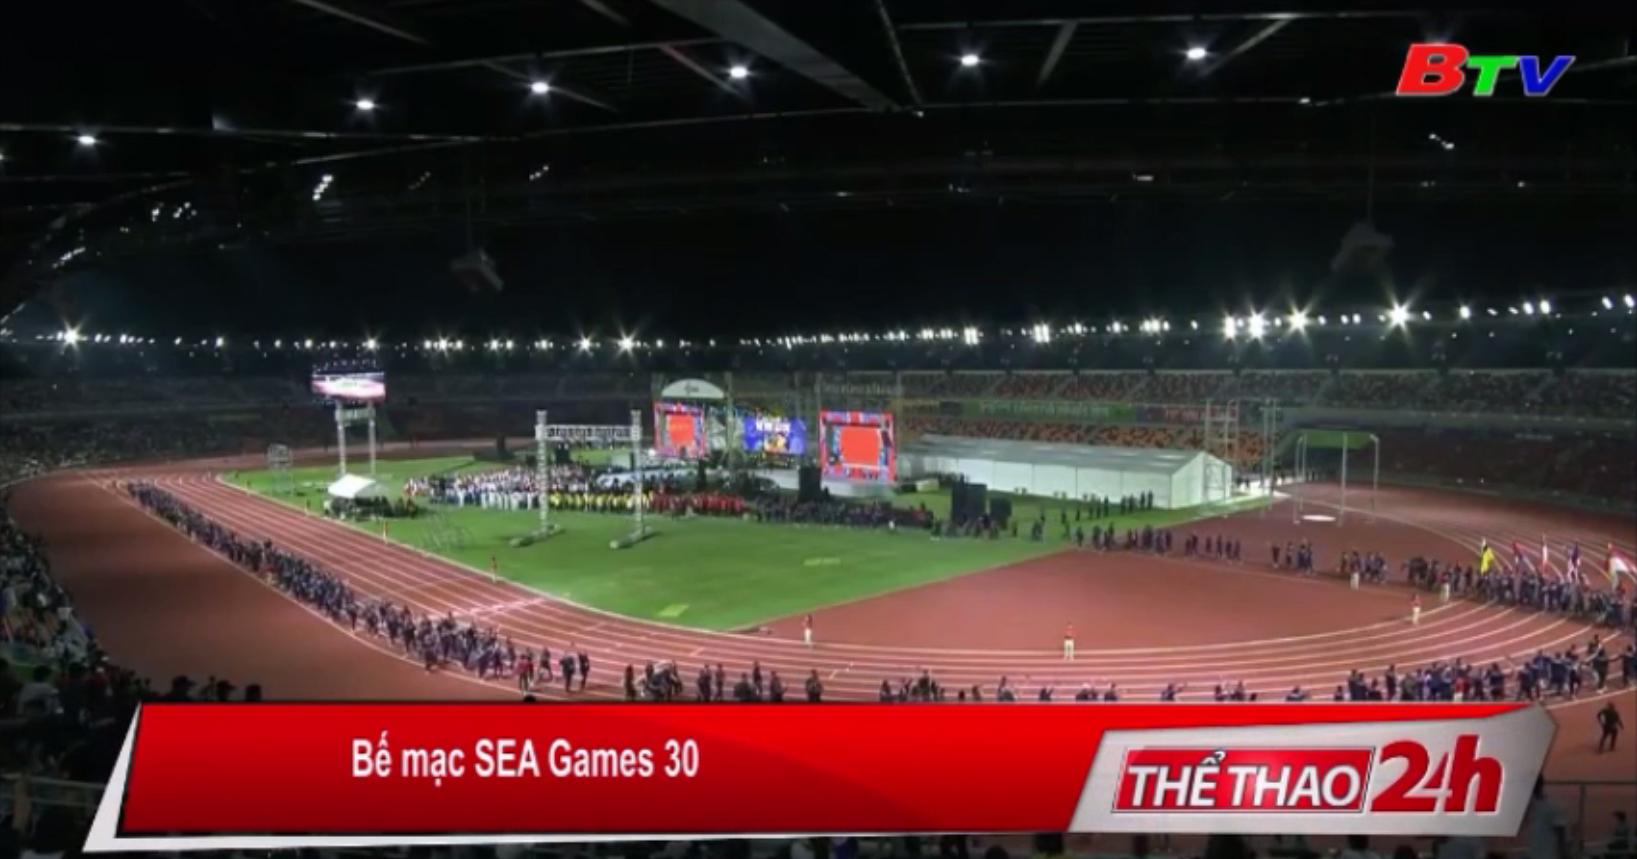 Bế mạc SEA Games 30